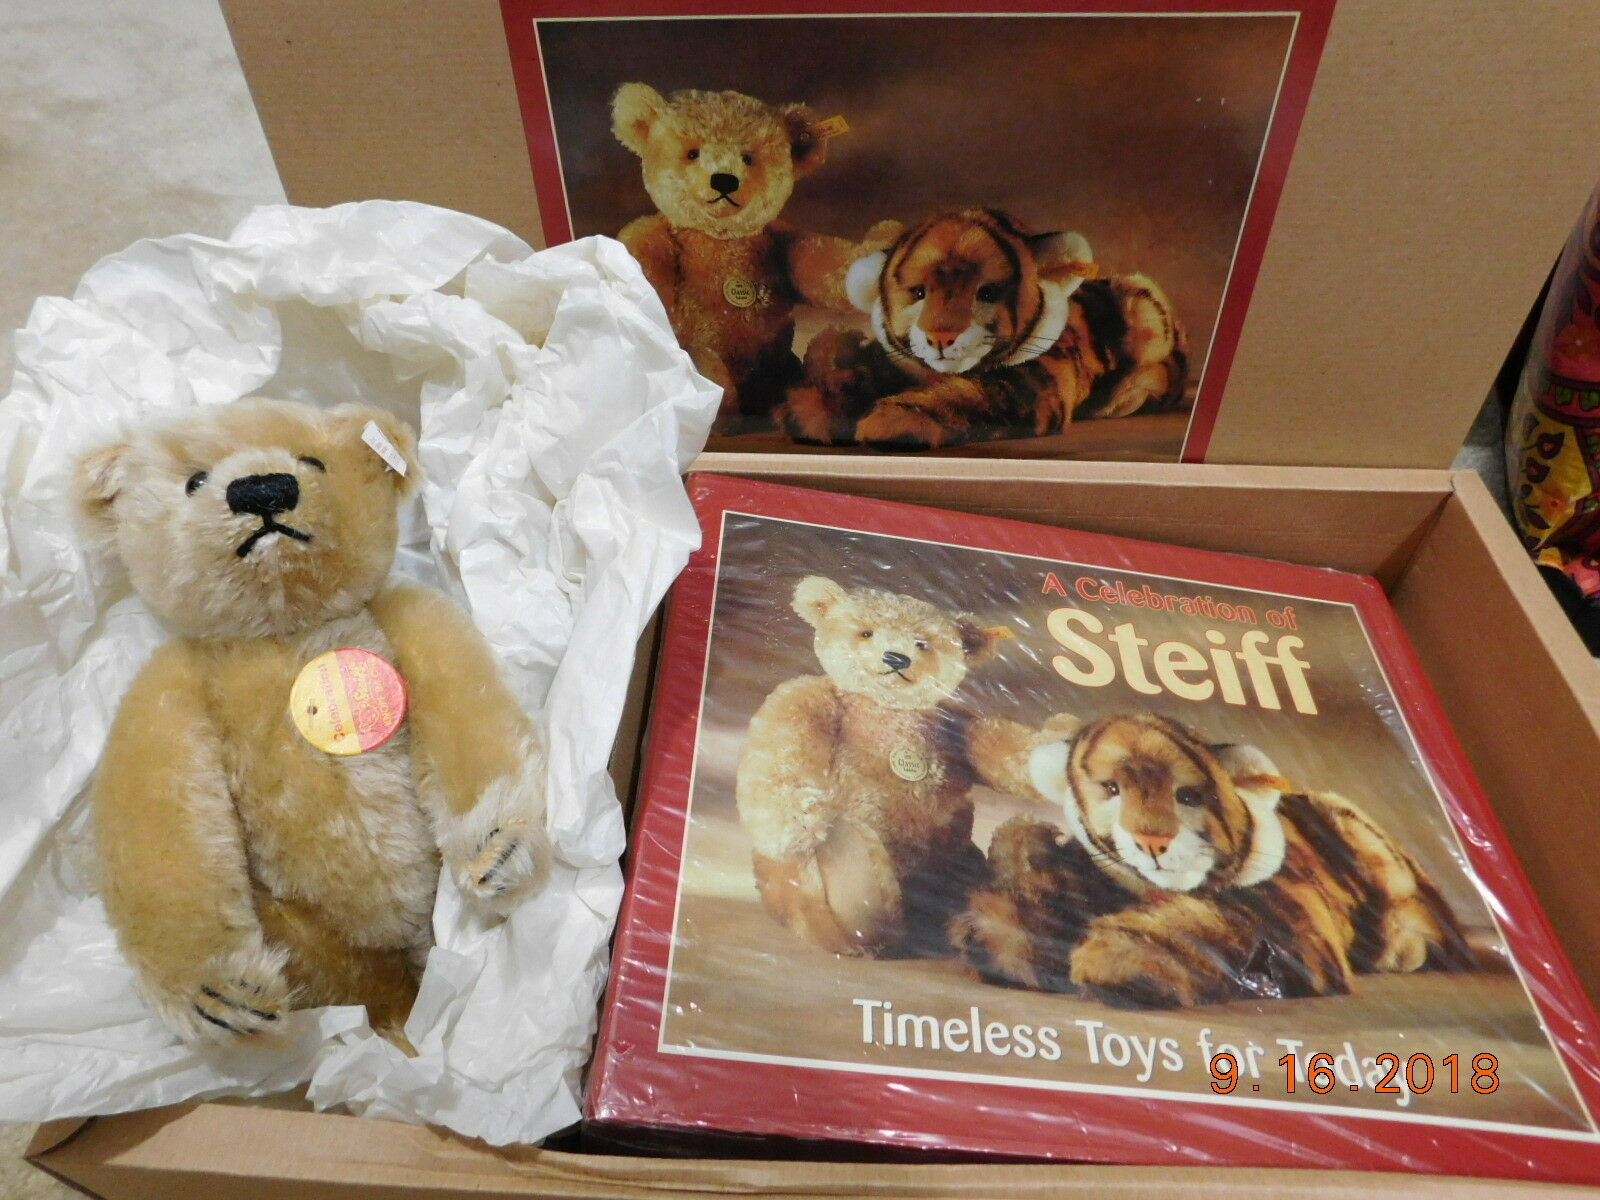 NEW~STEIFF 1997  665325 LTD.ED.TEDDY BEAR W/ A CELEBRATION OF STEIFF BOOK & COA